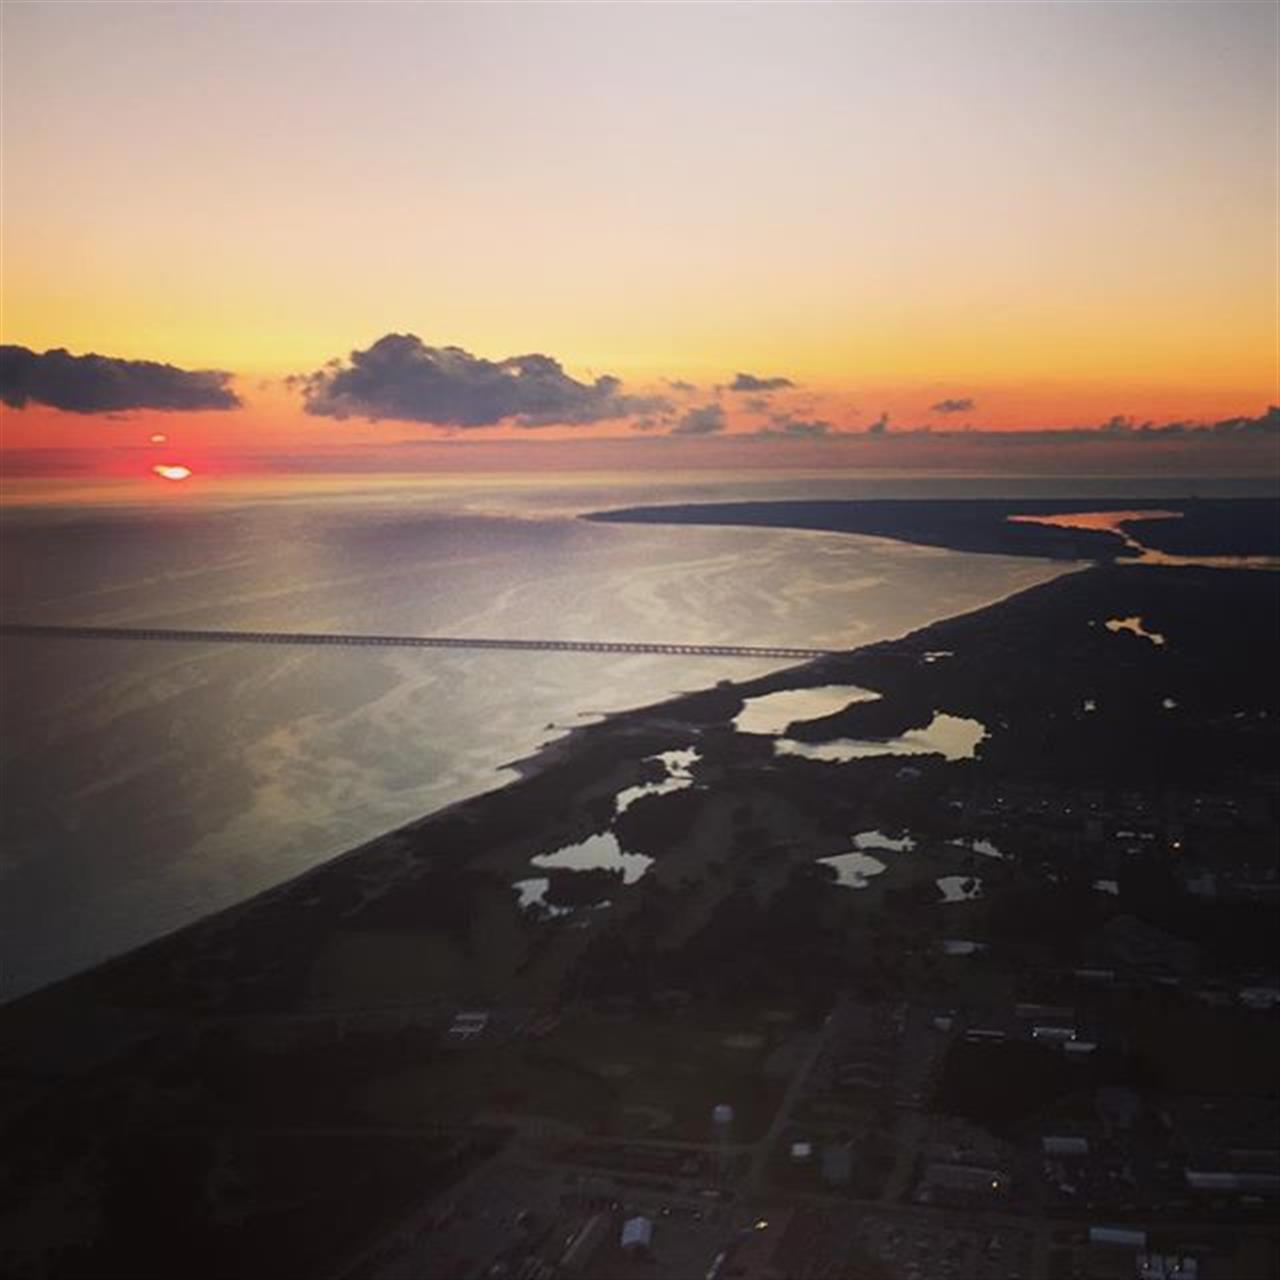 Sunrise over the #ChesapeakeBay and #VirginiaBeach. #LeadingRElocal #charmedlife